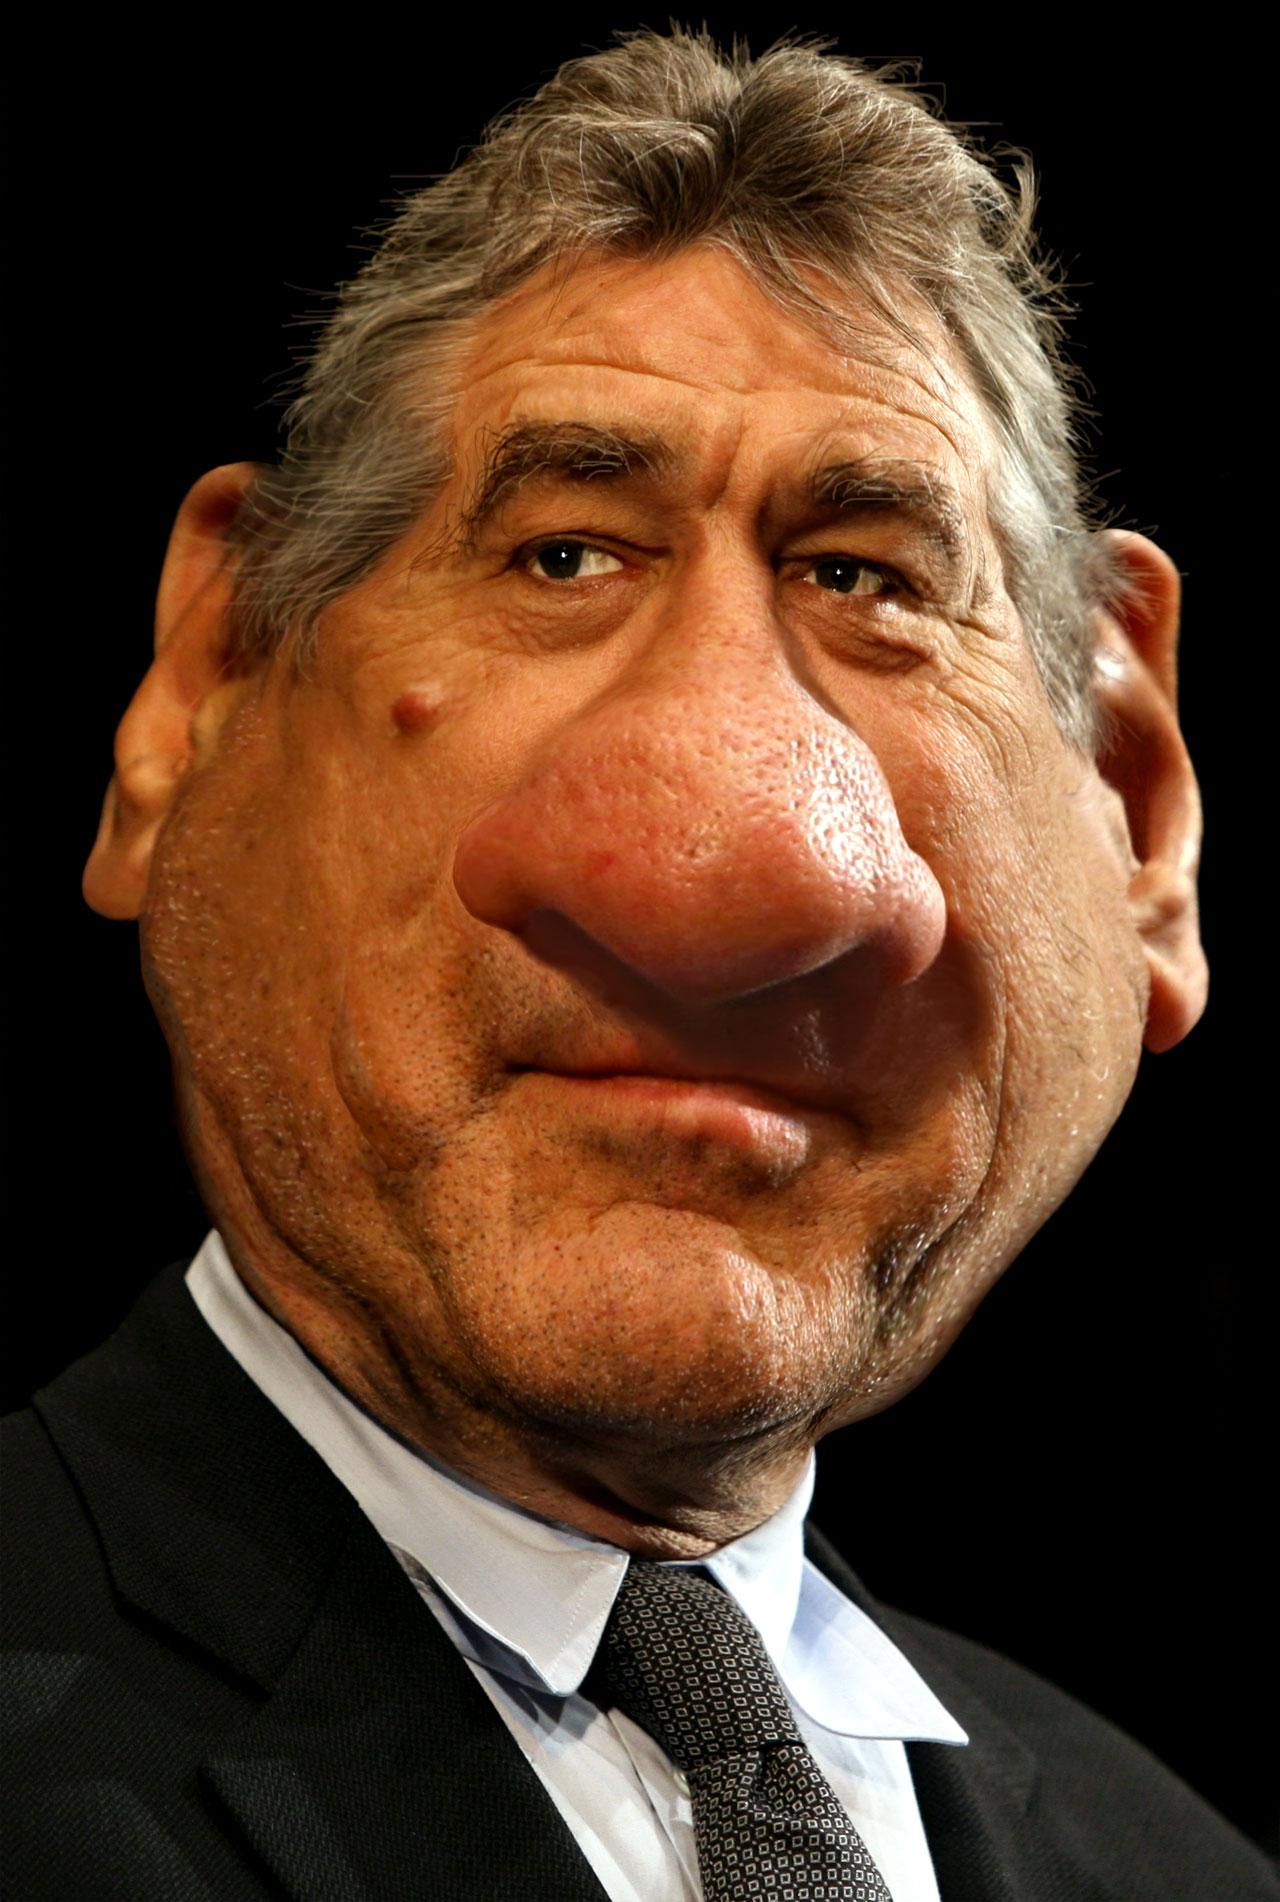 Big Nose Celebrities Pictures - Freaking News